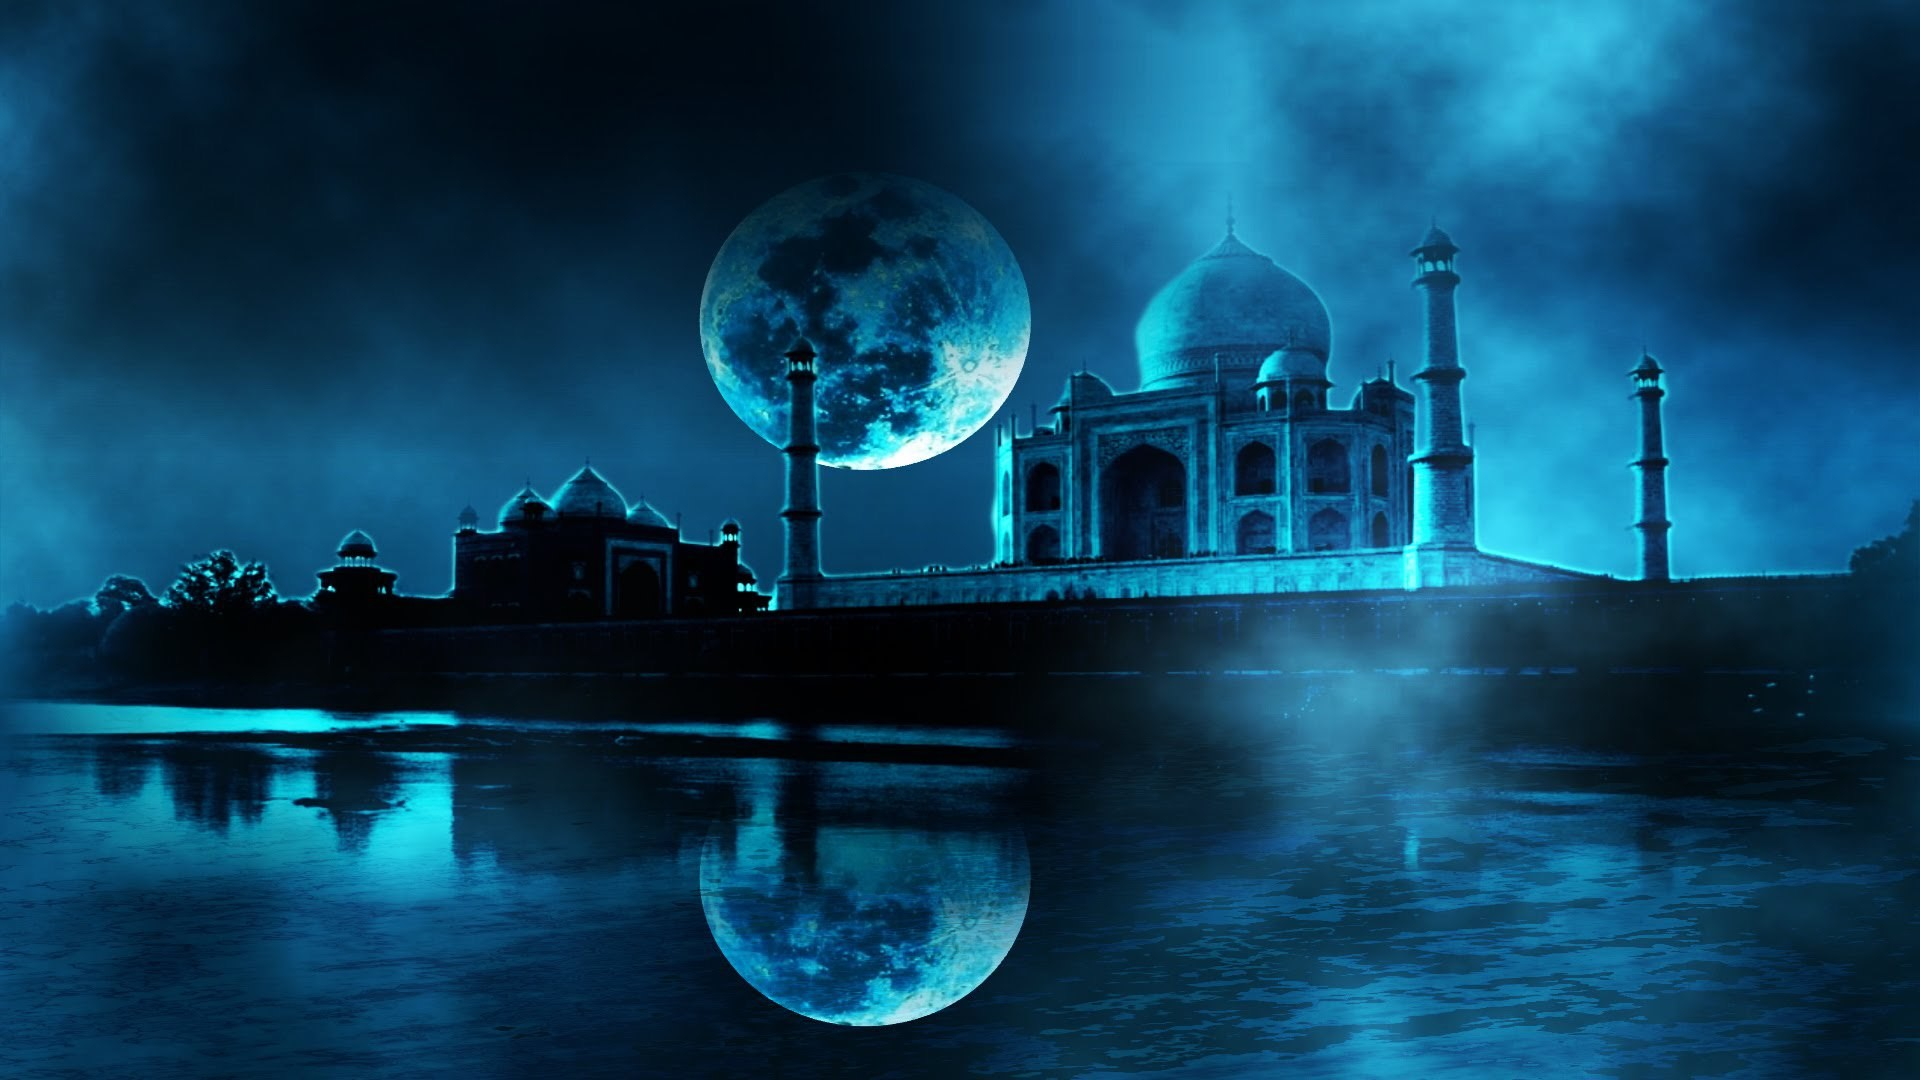 Fall In The Mountains Wallpaper Taj Mahal At Night Wallpaper 3d 183 ①